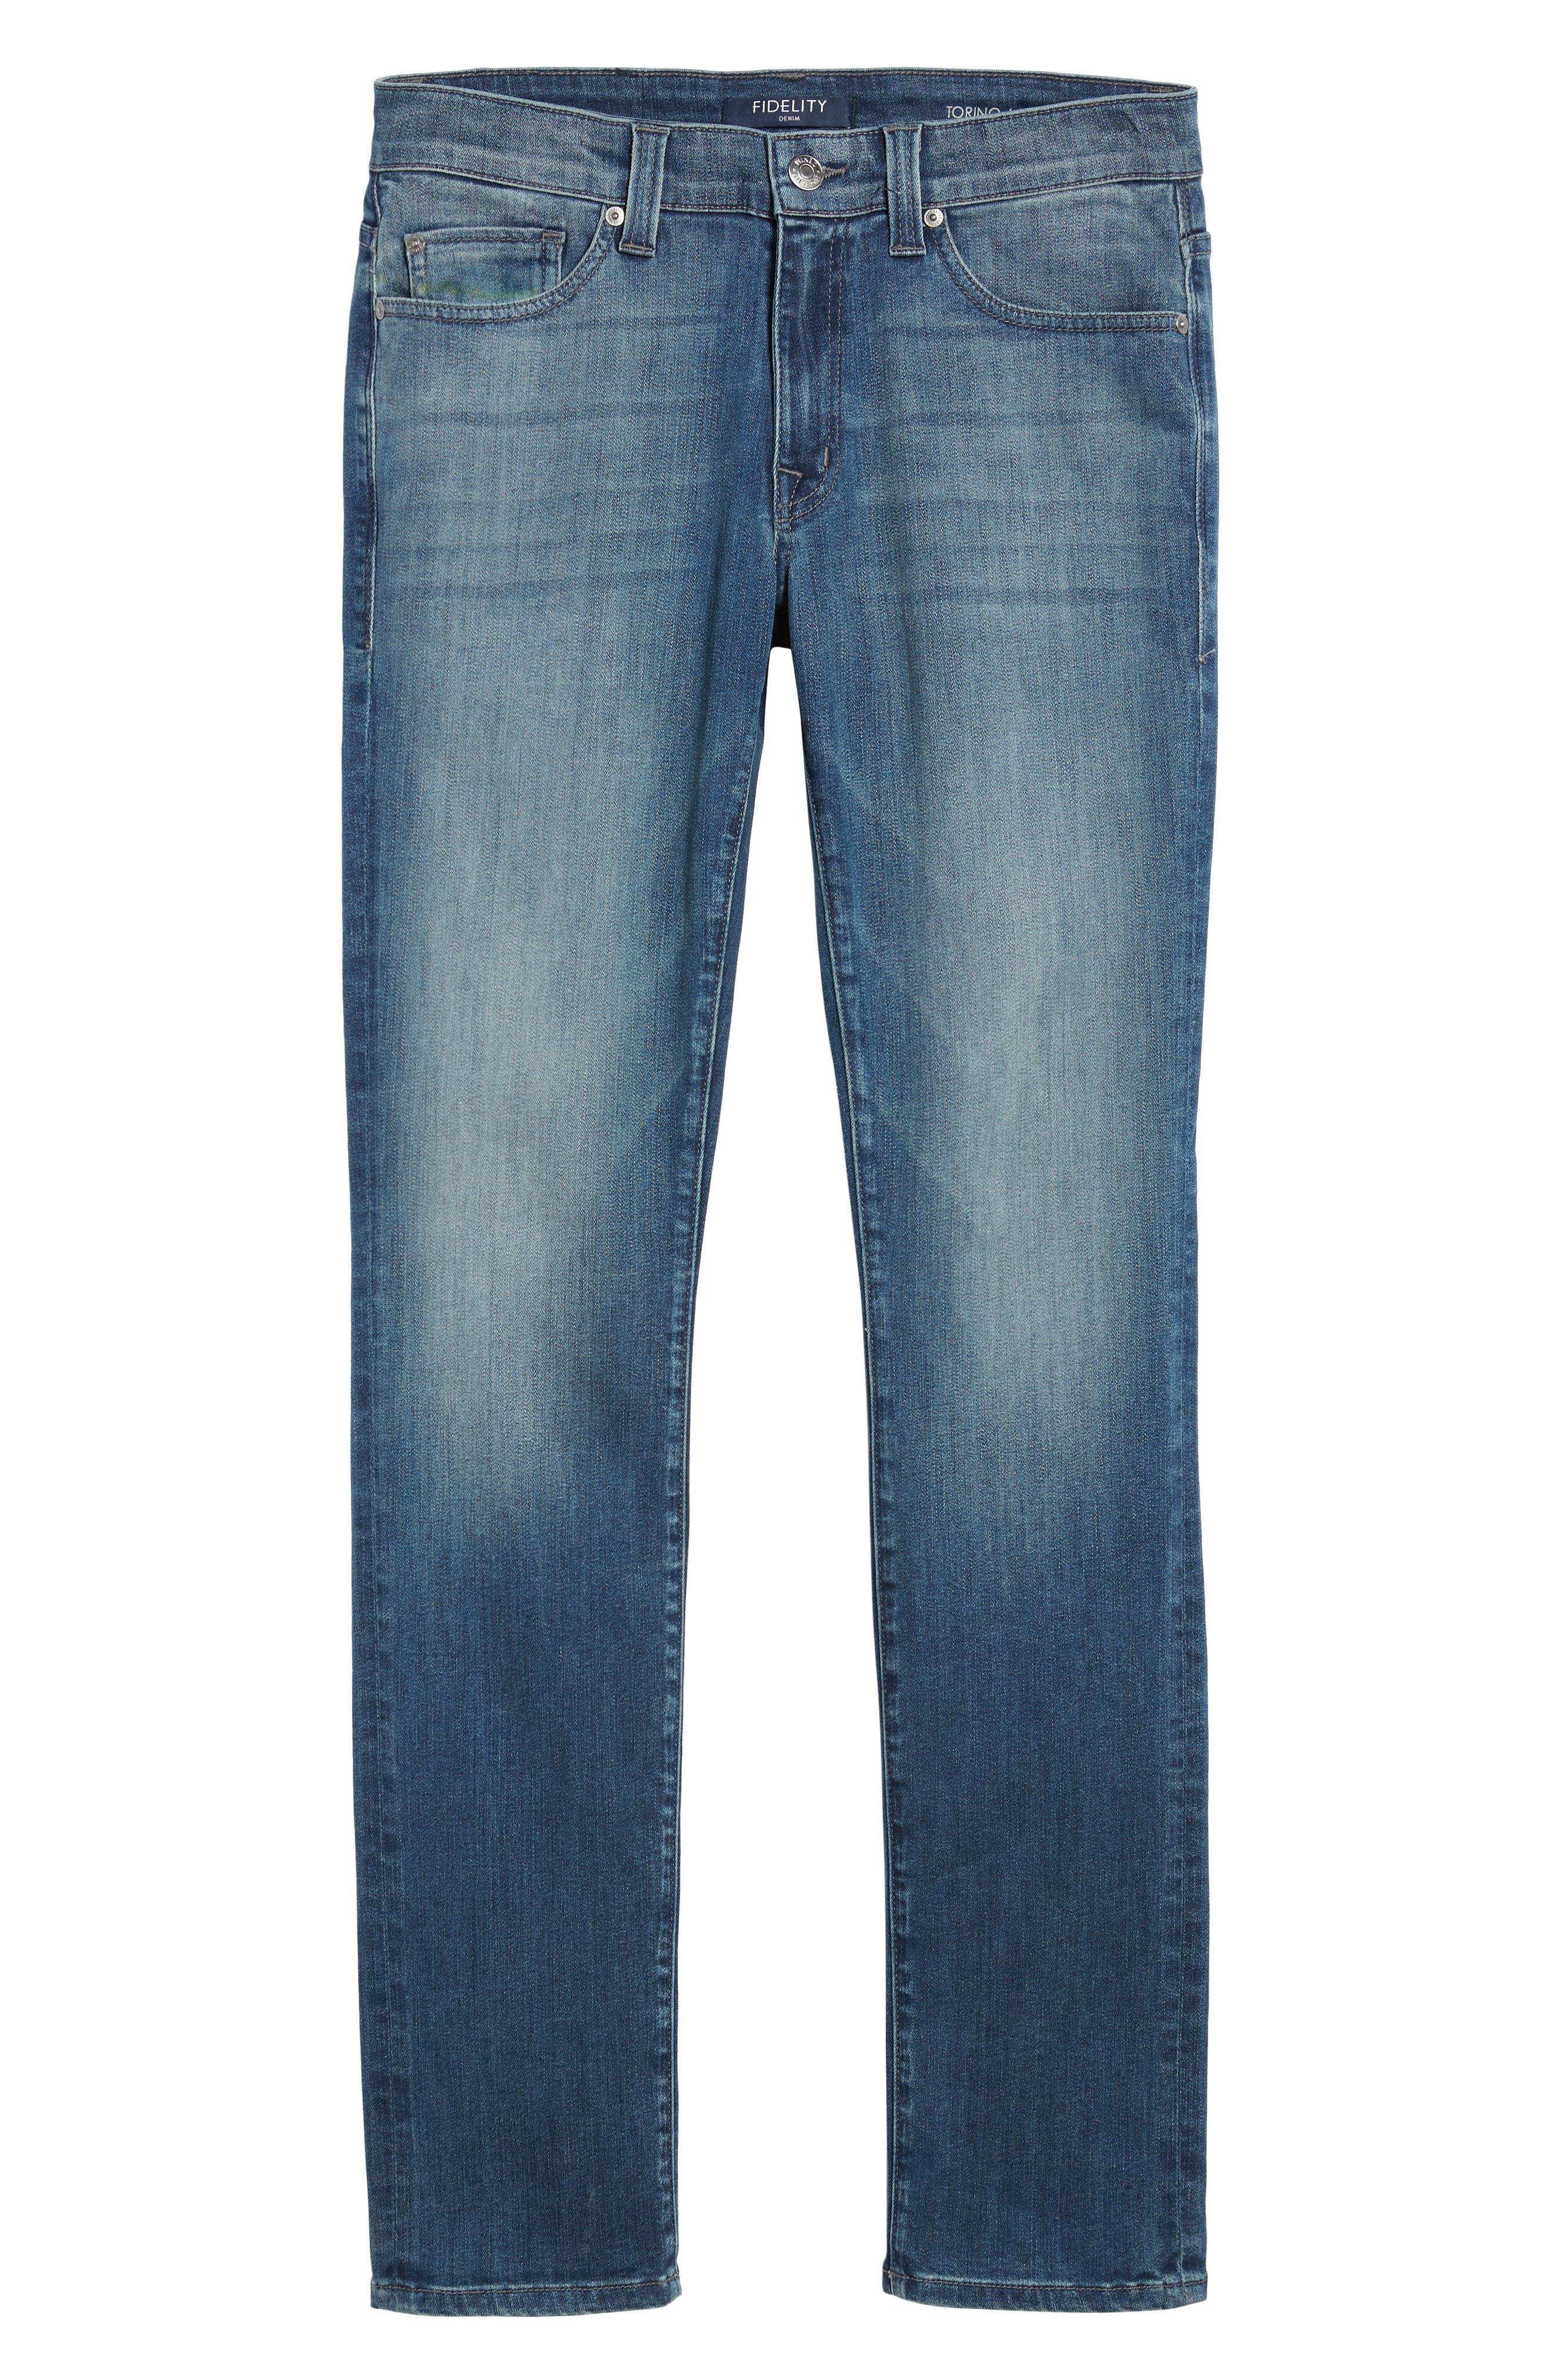 FIDELITY DENIM,                             Torino Slim Fit Jeans,                             Alternate thumbnail 6, color,                             400